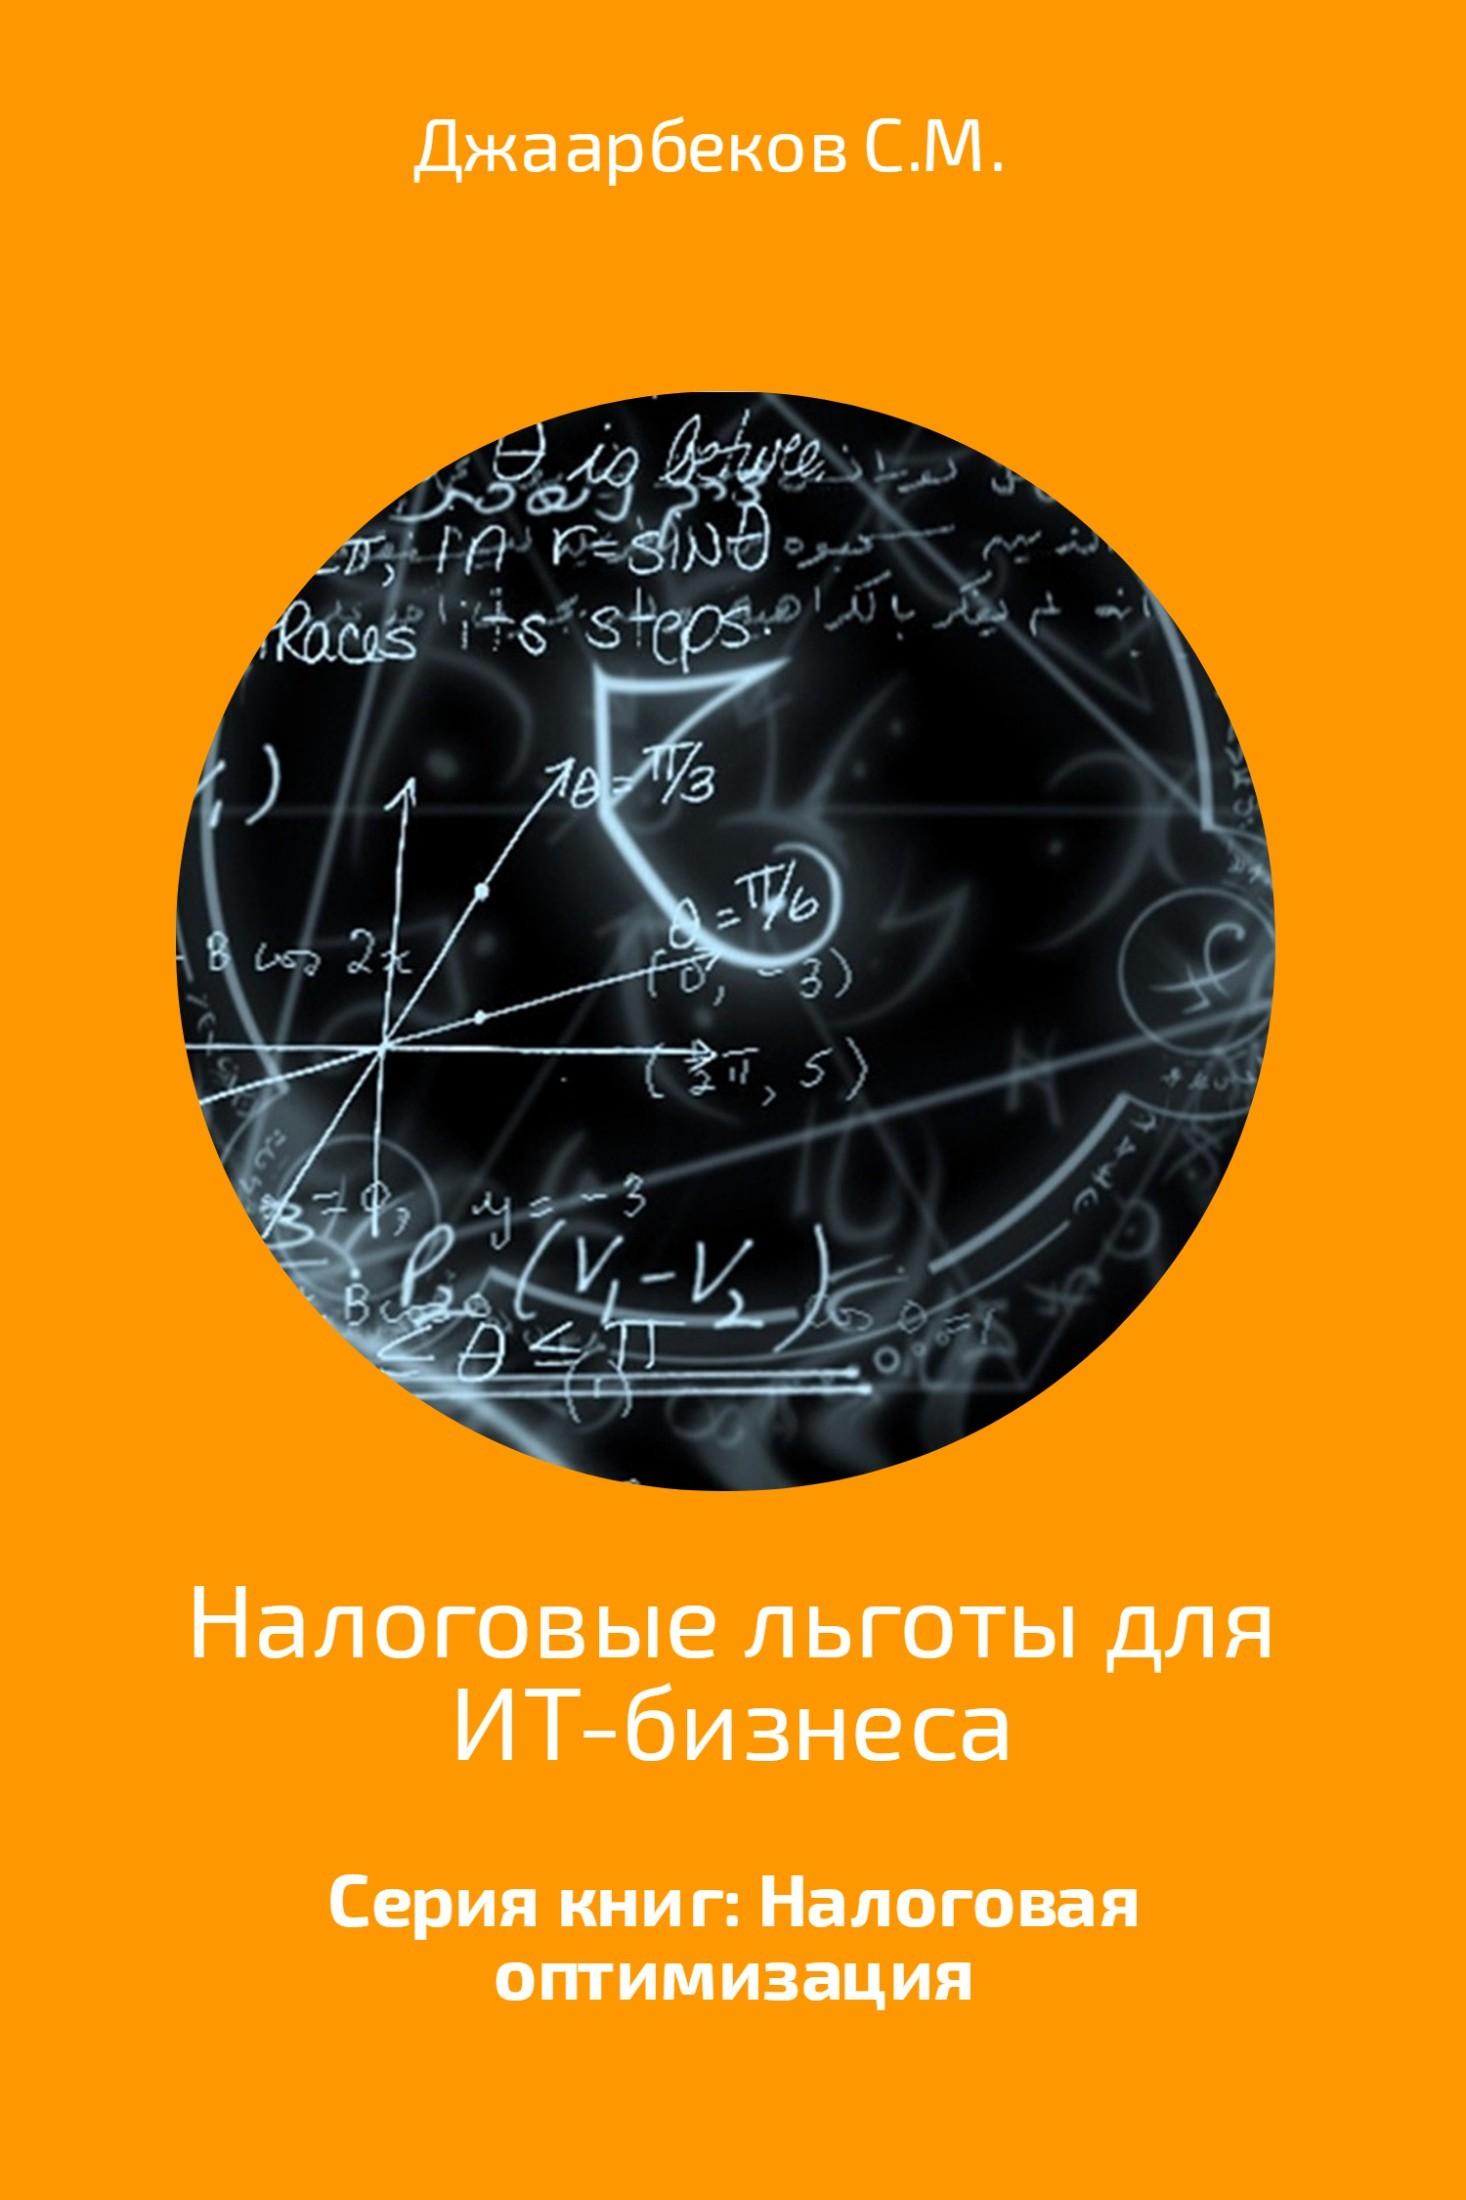 Обложка книги. Автор - Джаарбеков Маратович